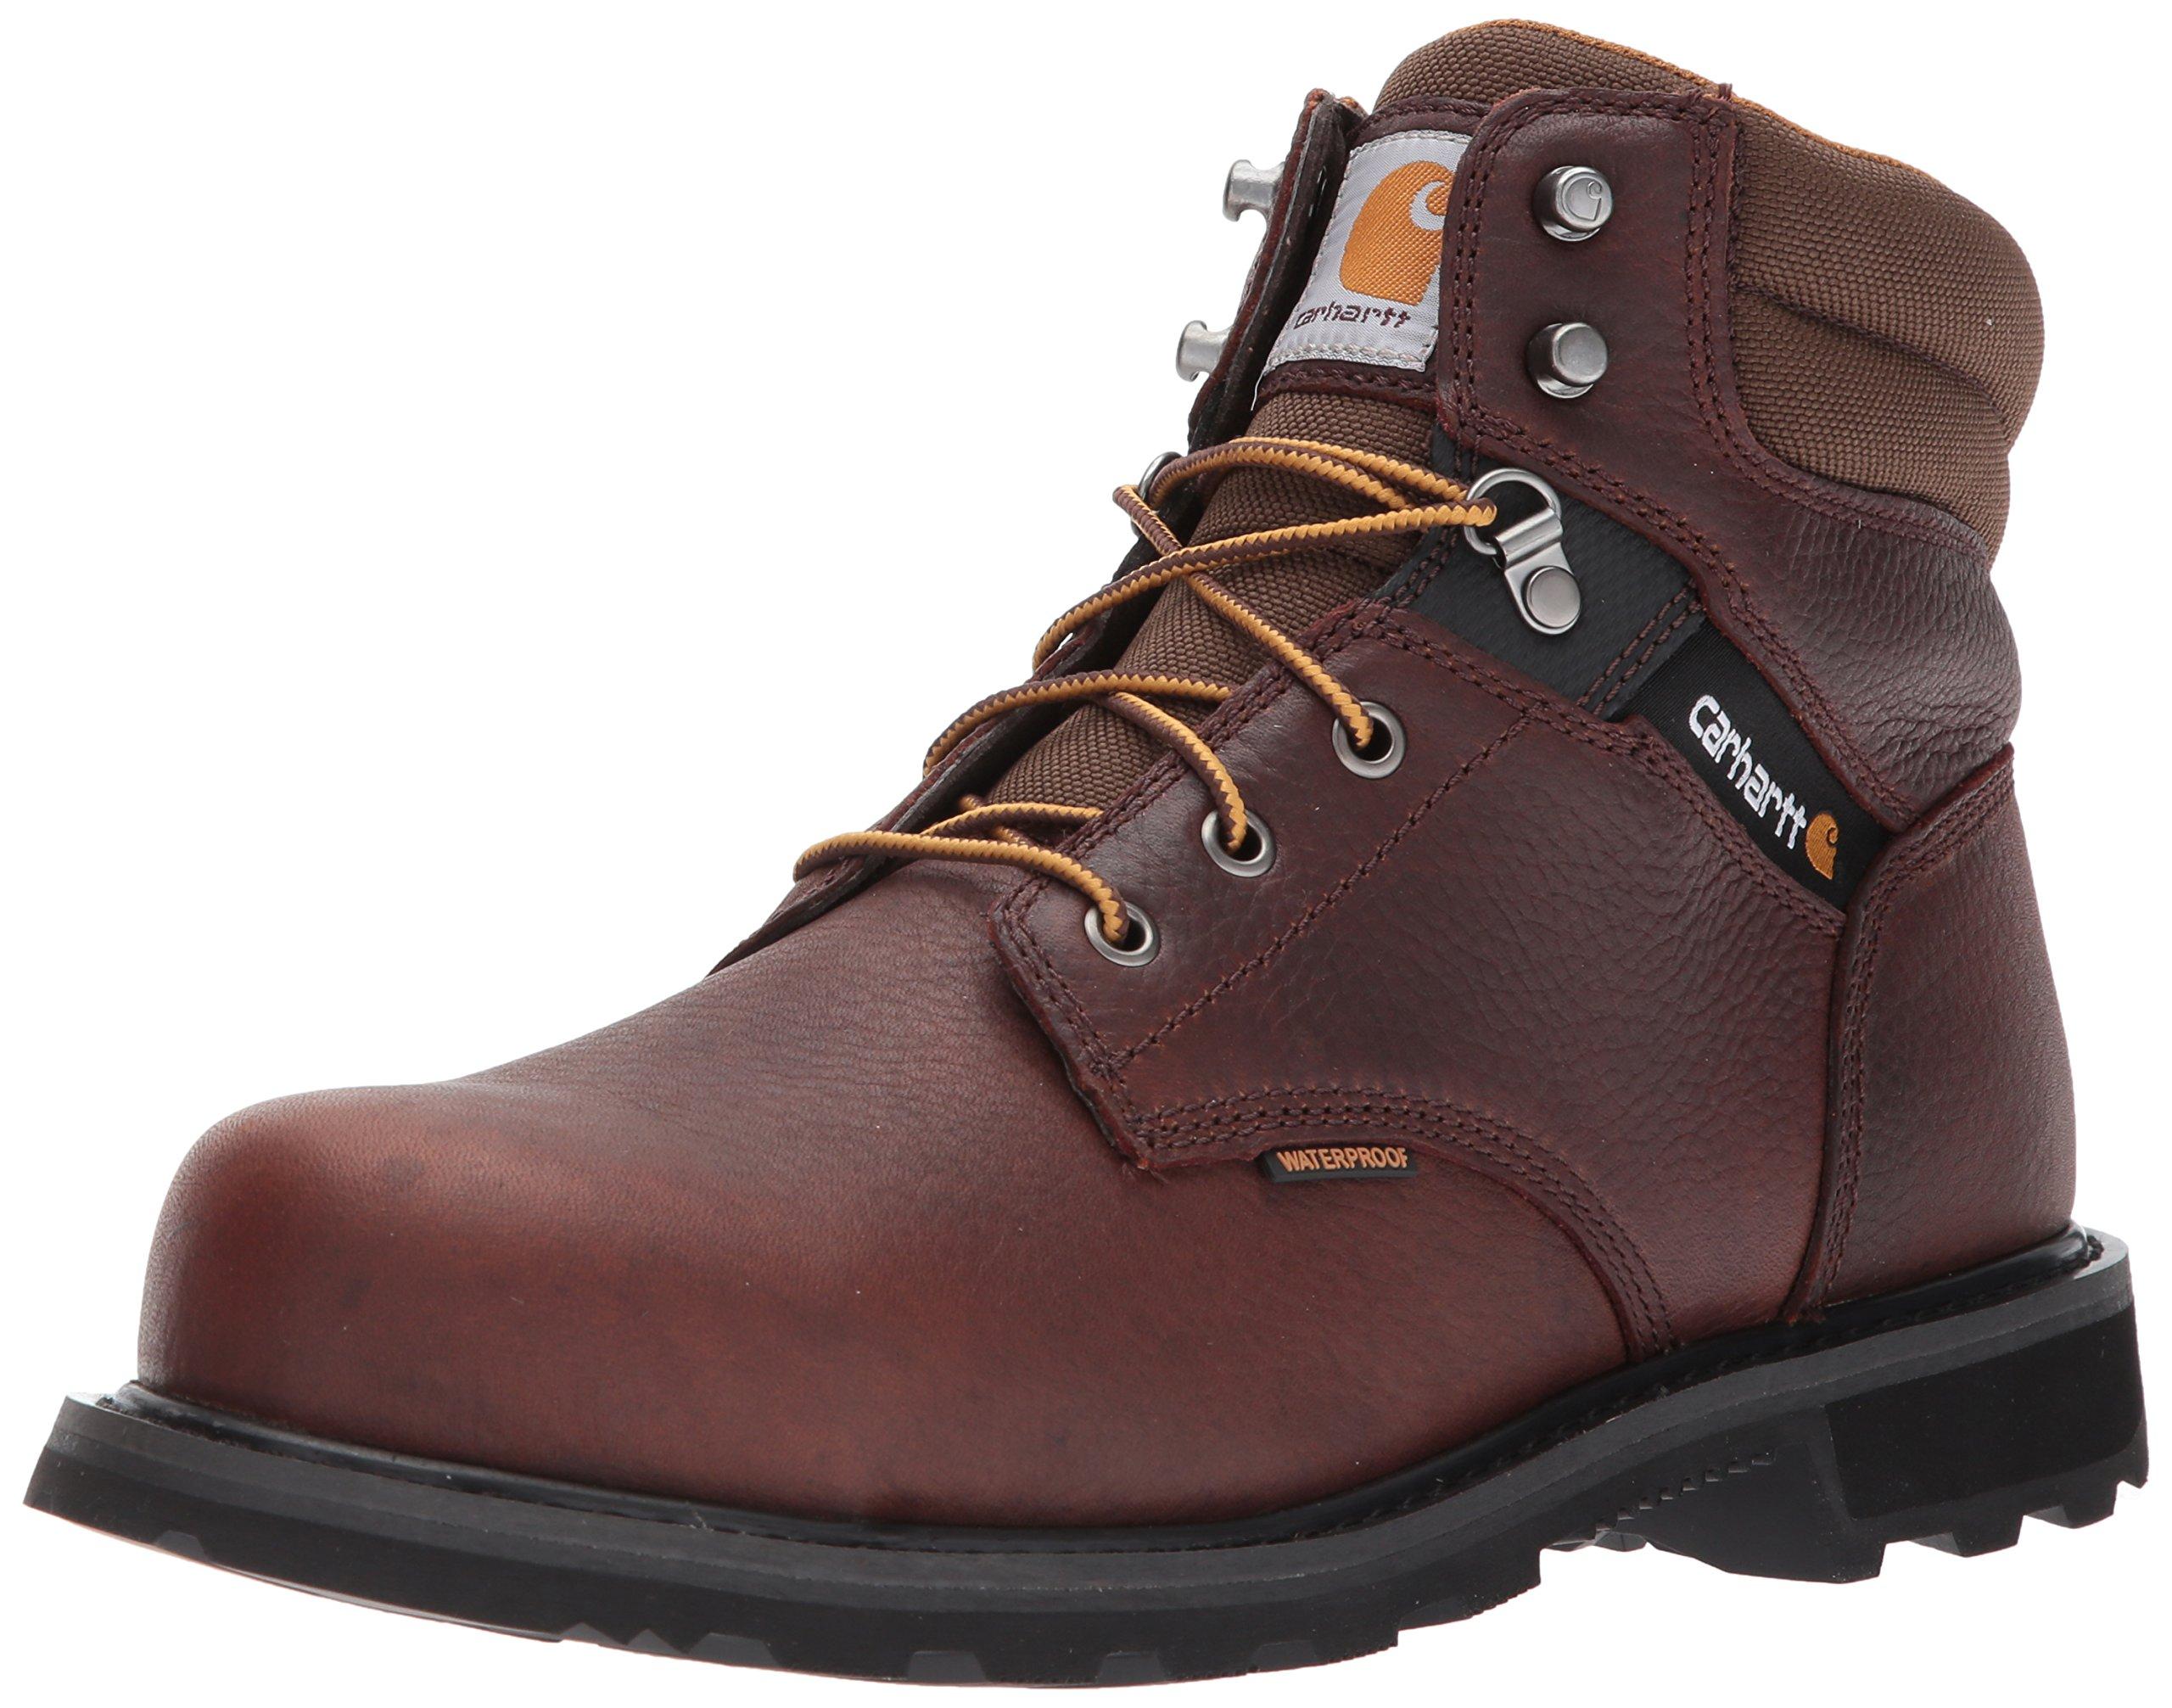 "Carhartt Men's 6"" Cmw6264 Leather Waterproof Breathable Steel Toe Work Boot Industrial"